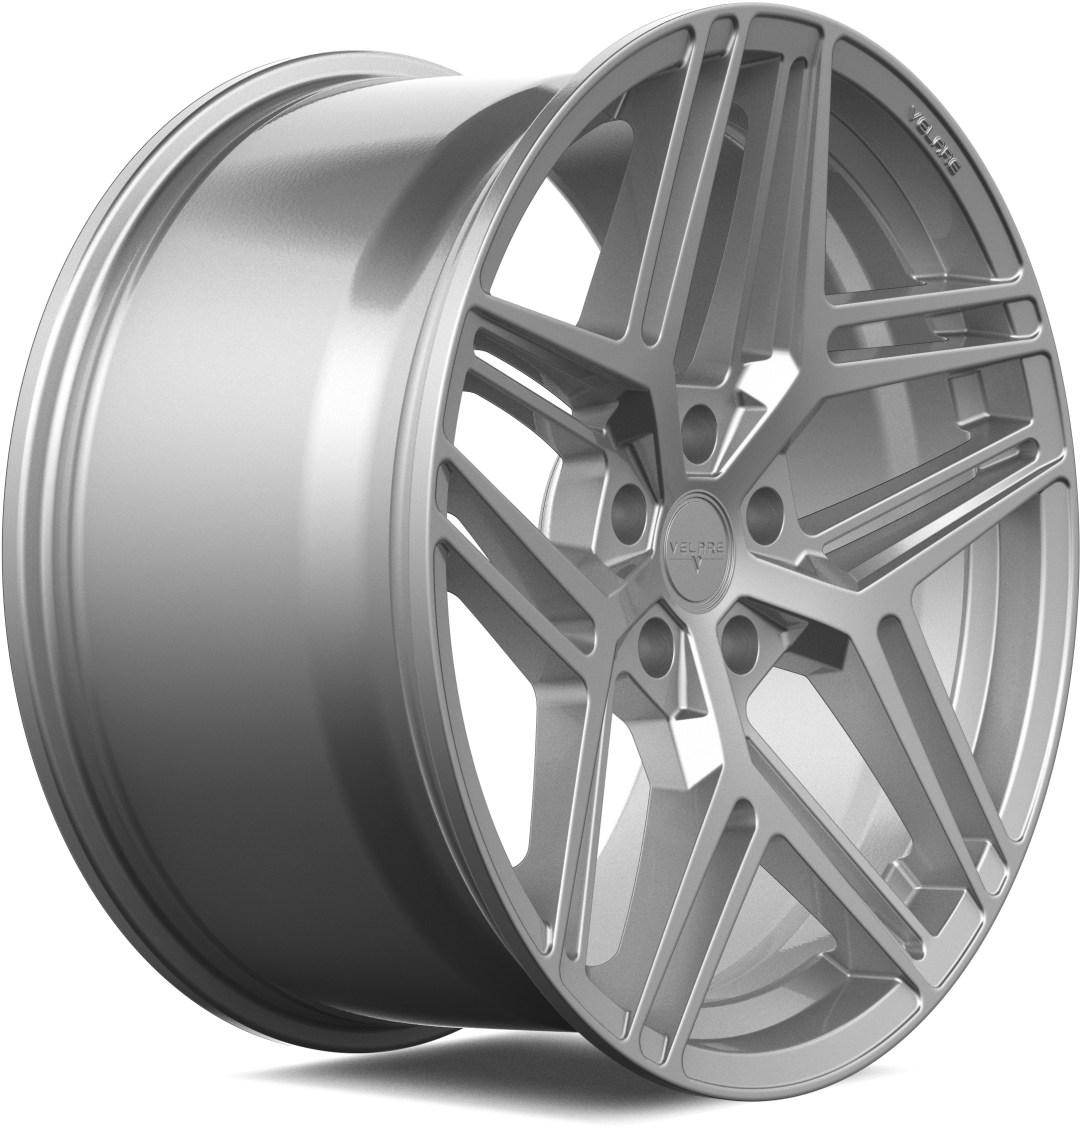 Velare VLR16 10j 20 Iridium Silver 3